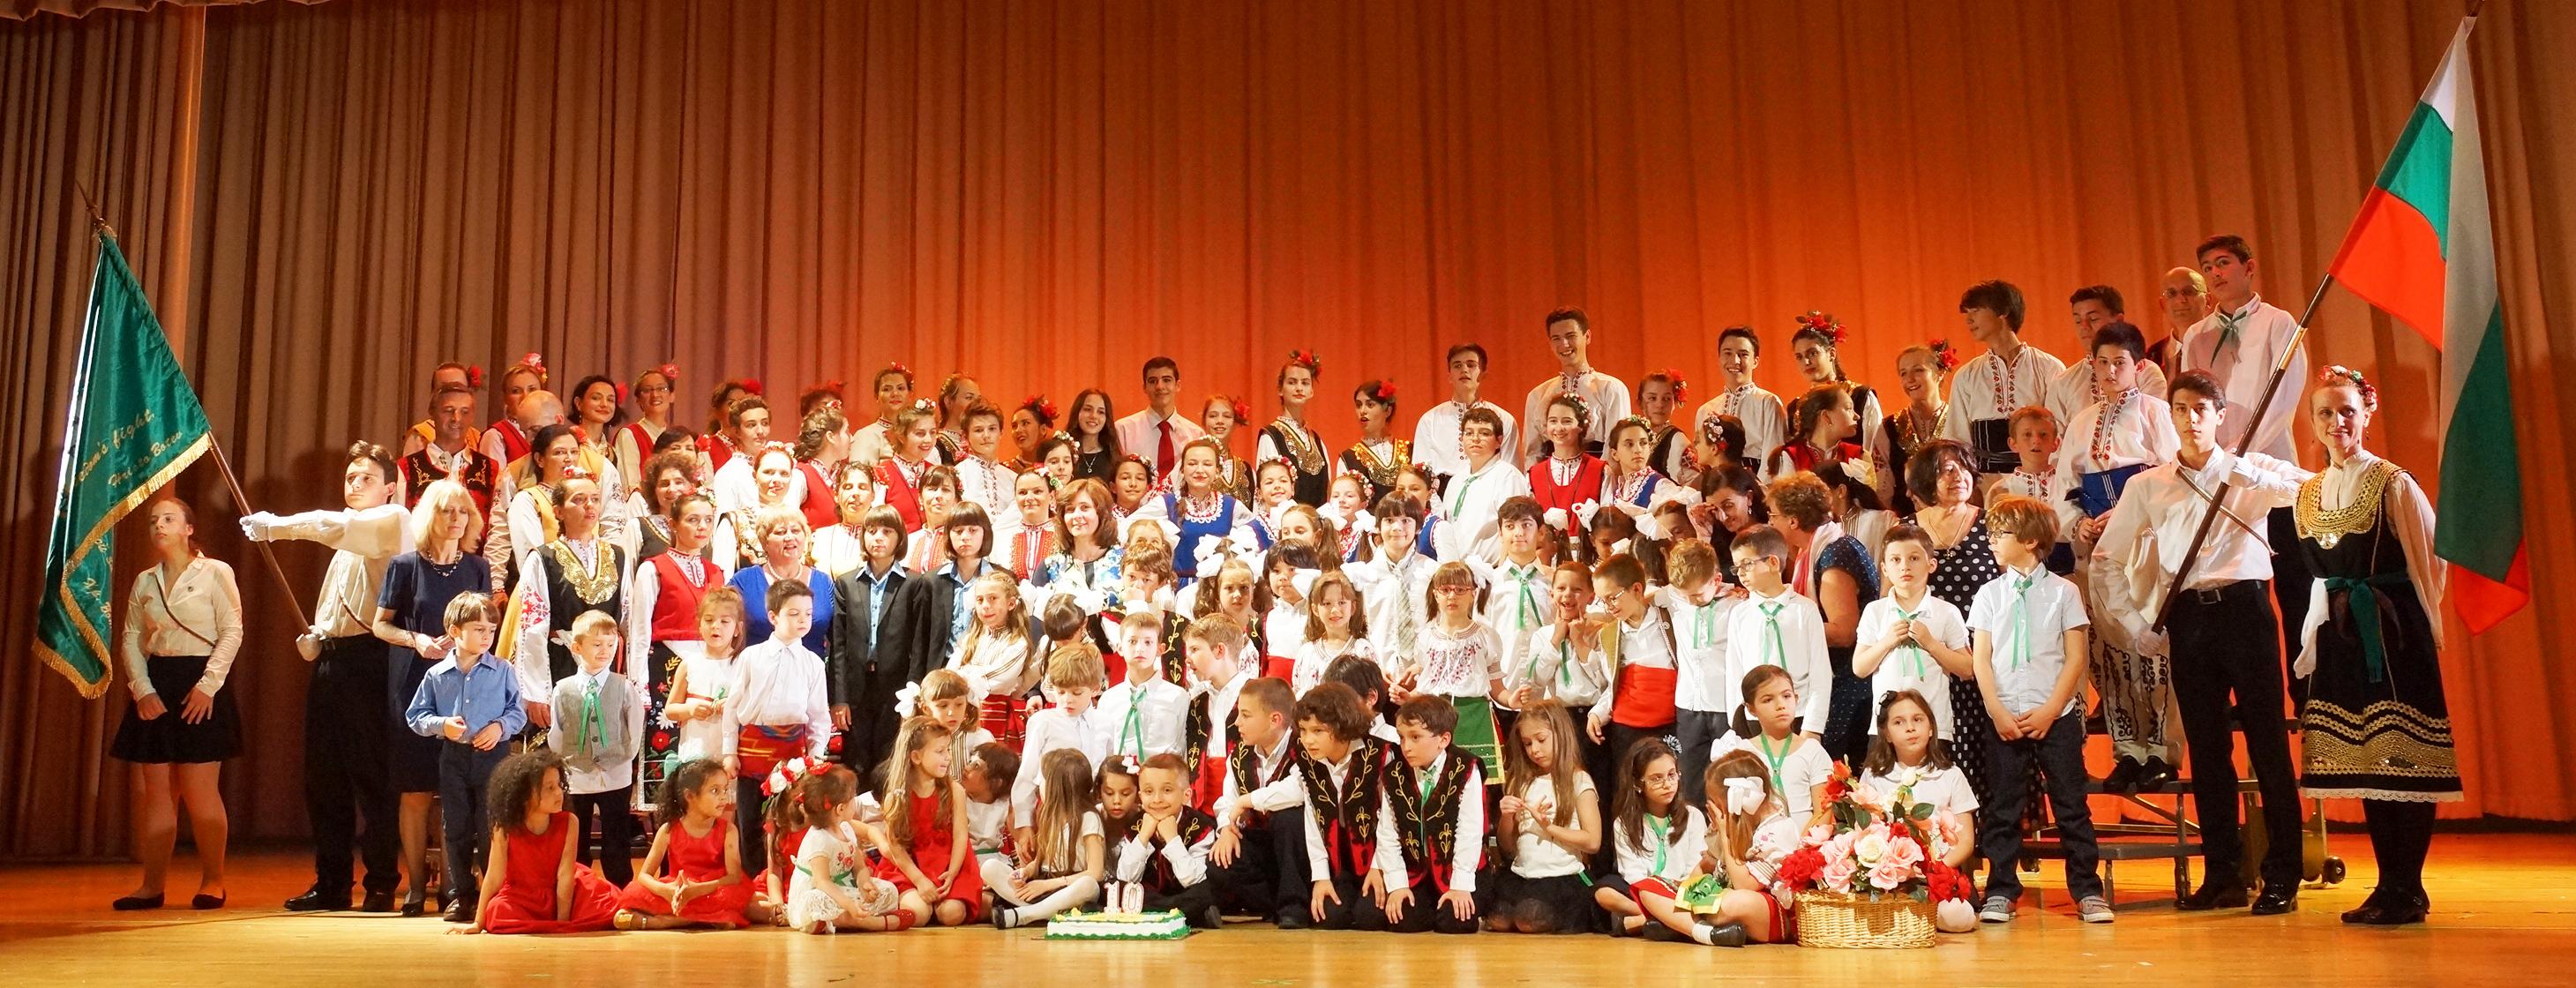 "Празничен концерт по случай 10 години училище ""Христо Ботев "", Ню Йорк. Сн. Яна Гергова"